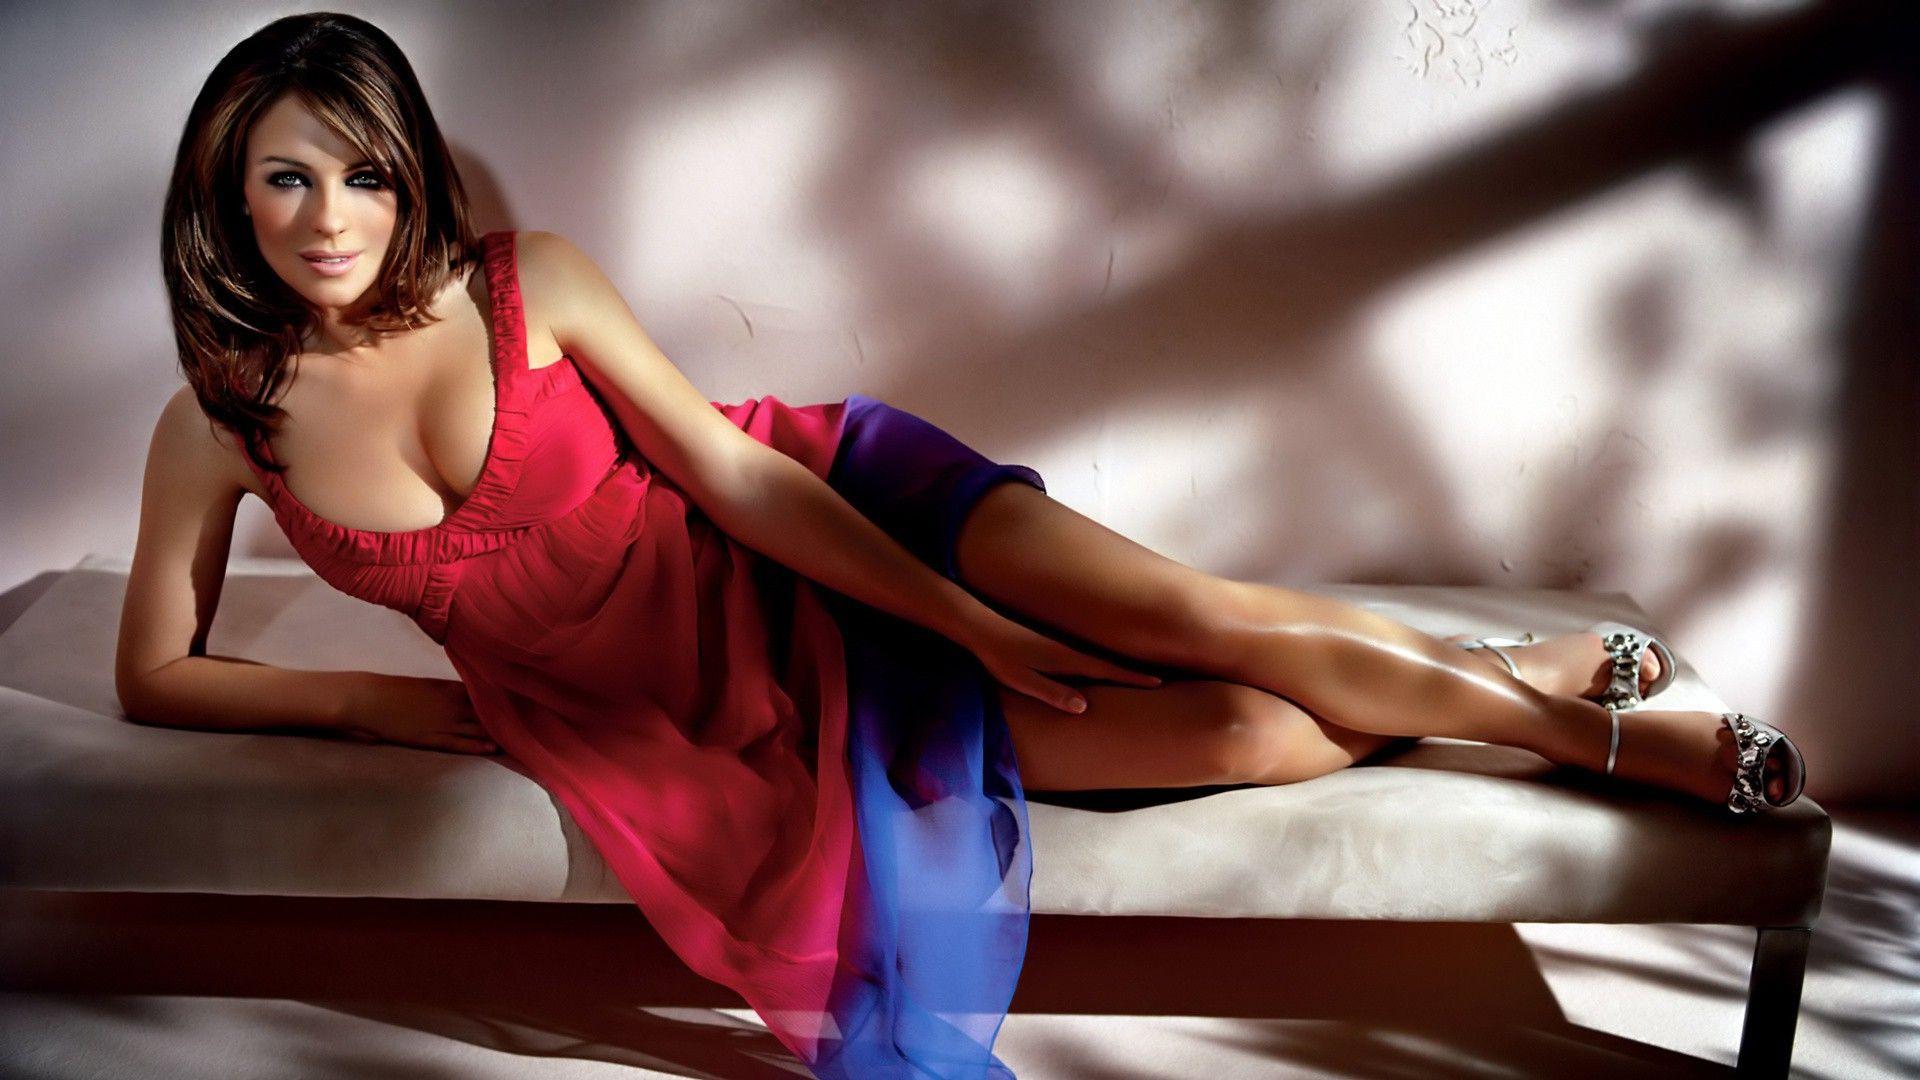 Download Sexy Women Wallpaper Hd Backgrounds Download Itlcat